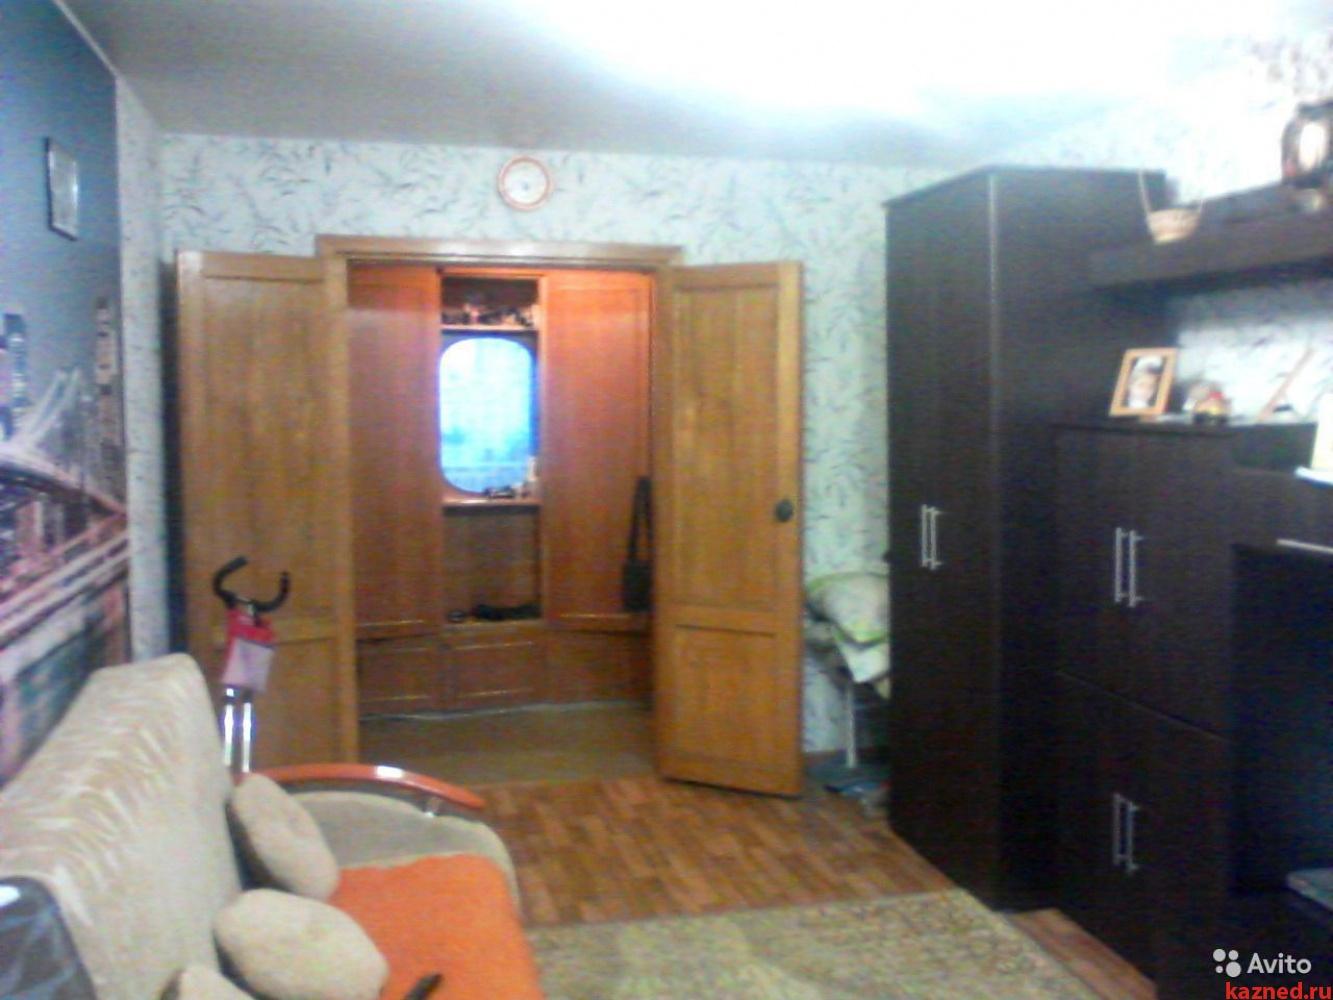 Продажа 3-к квартиры Ямашева 54, 65 м2  (миниатюра №4)